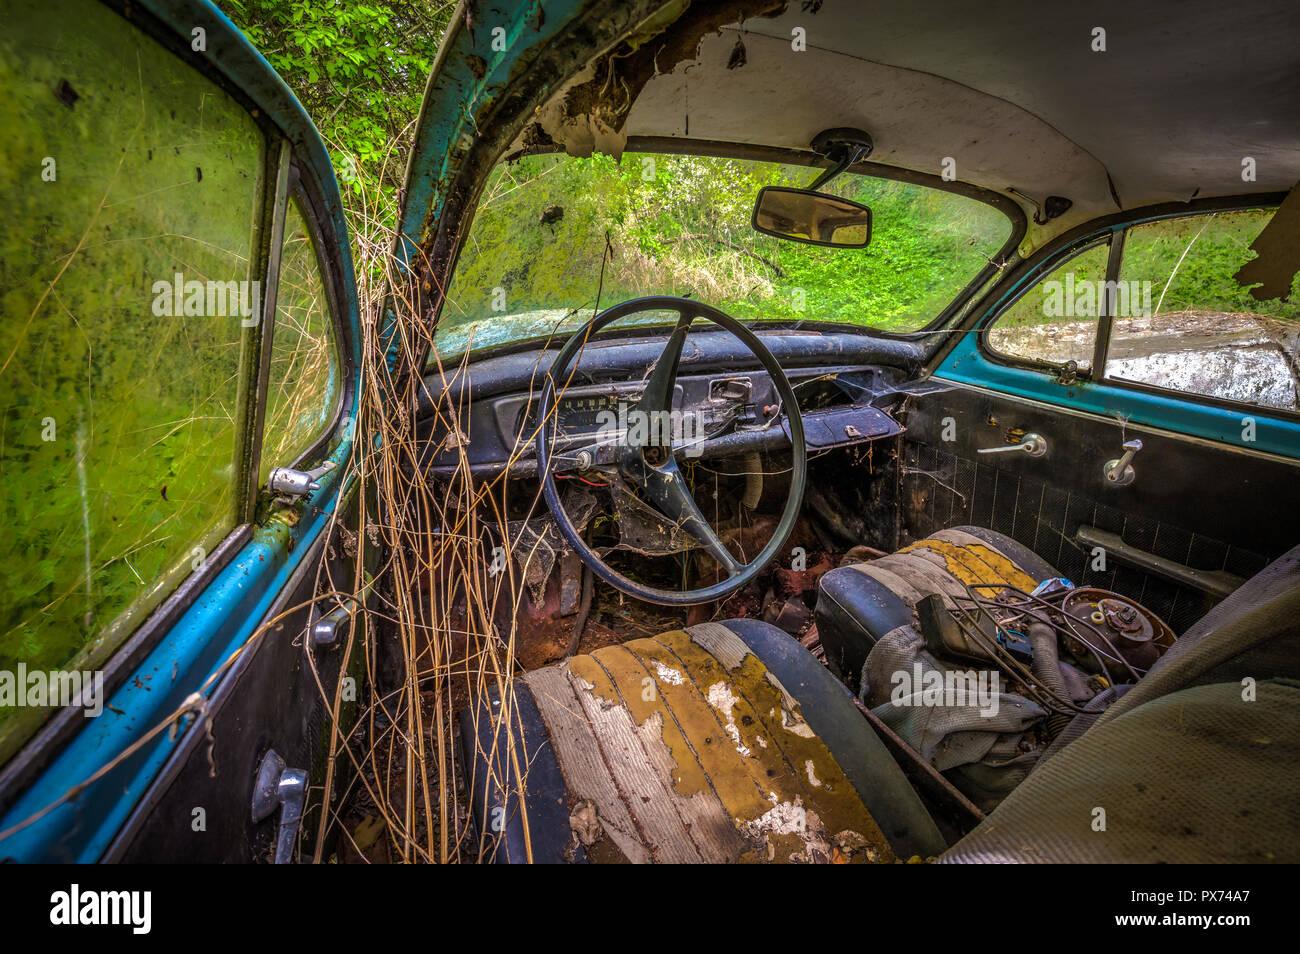 Interior of forgotten car decaying in the garden, urbex Czech republic - Stock Image